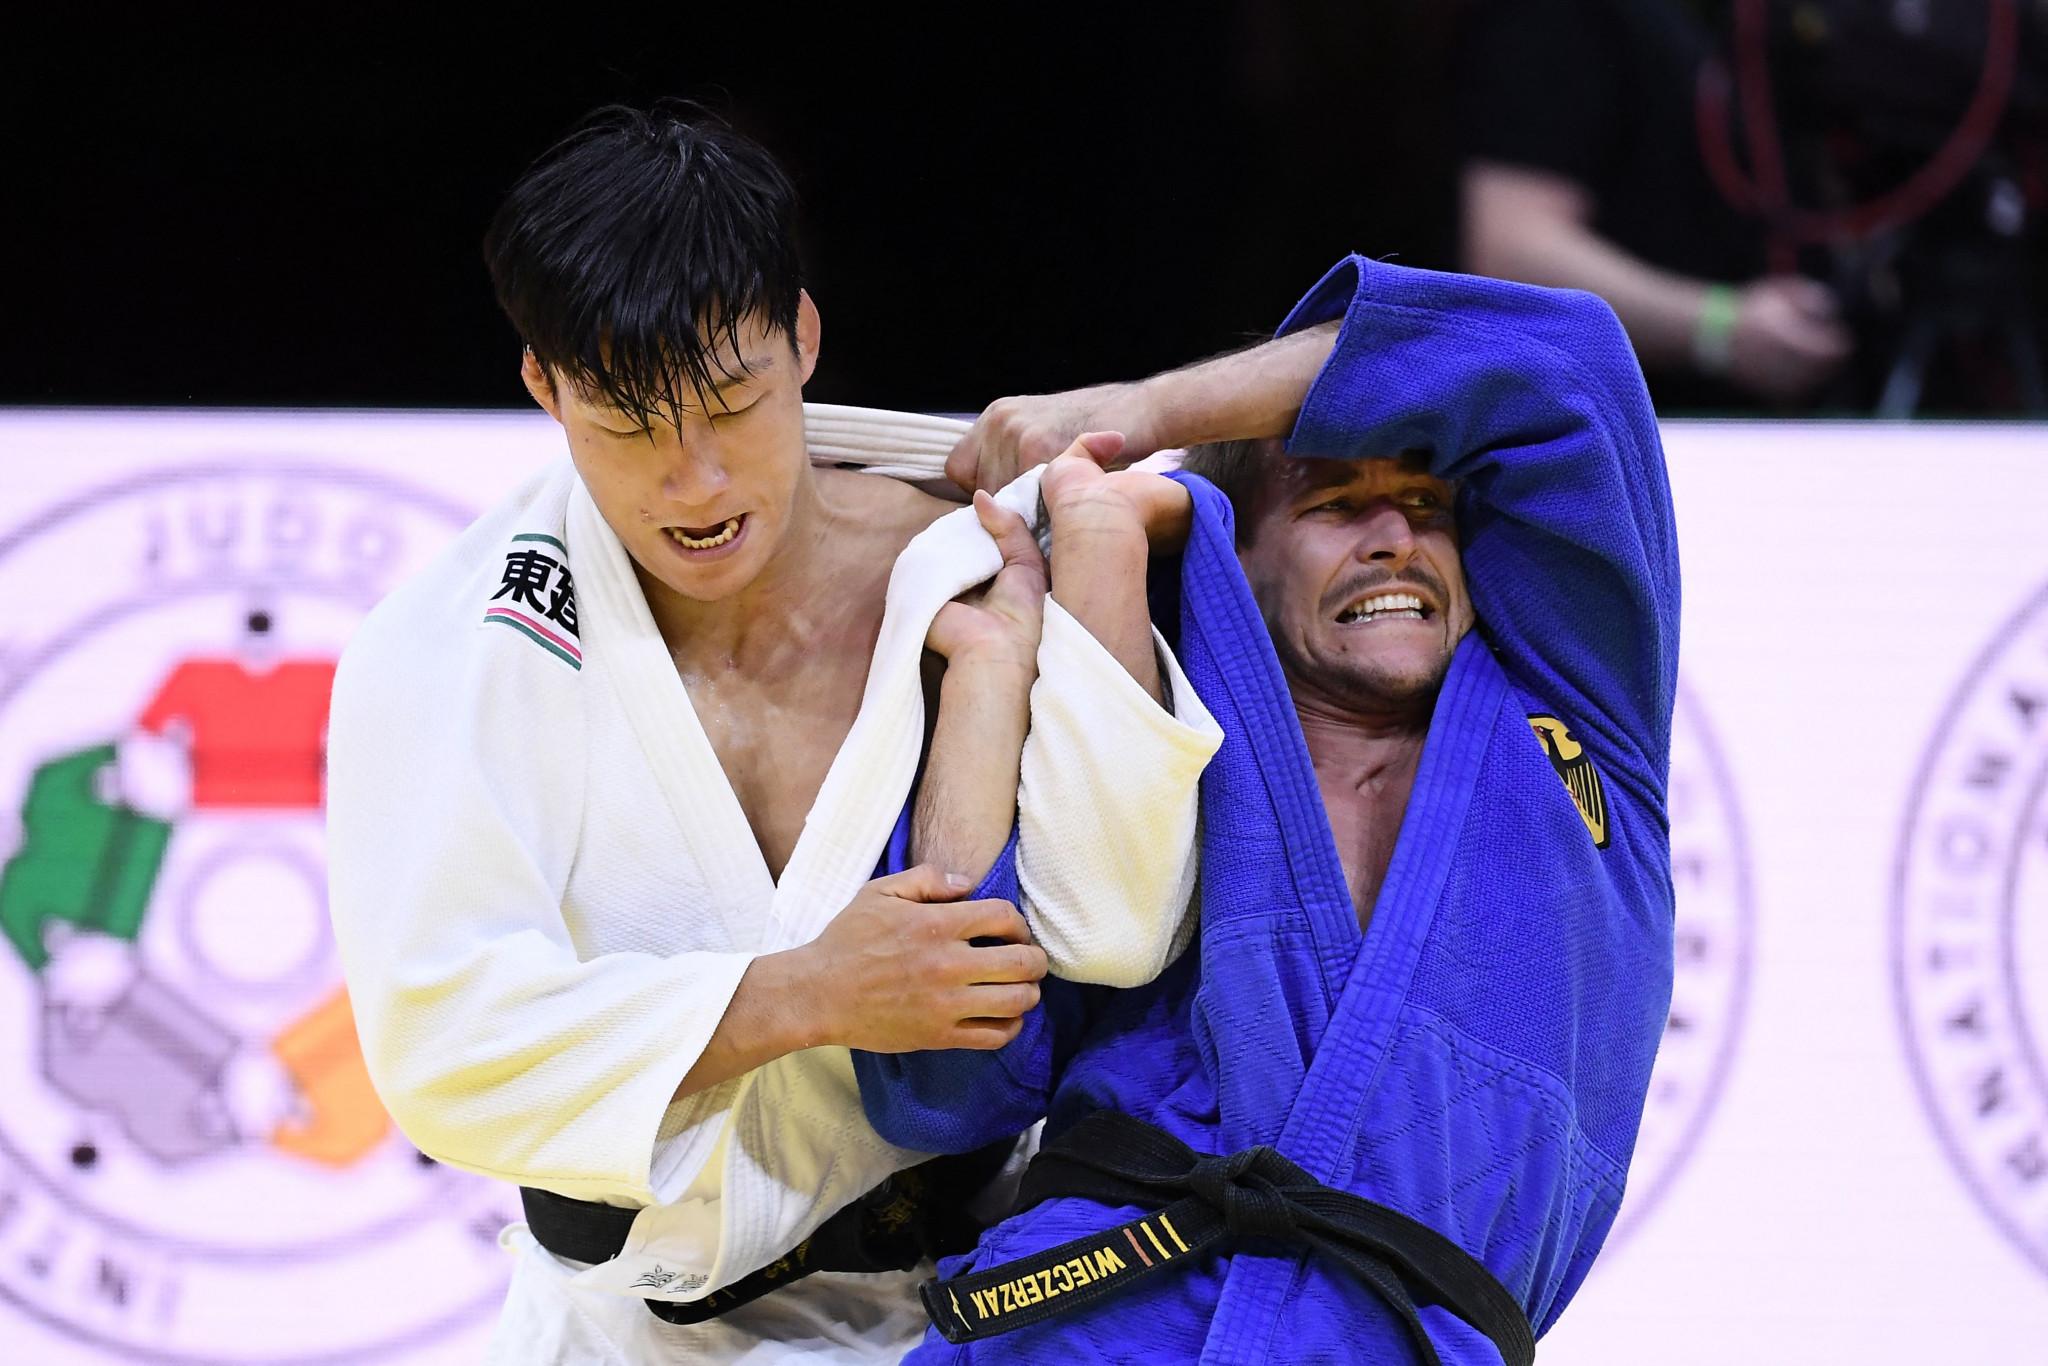 Alexander Wieczerzak, right, tries to gain the upper hand against Fujiwara ©Getty Images